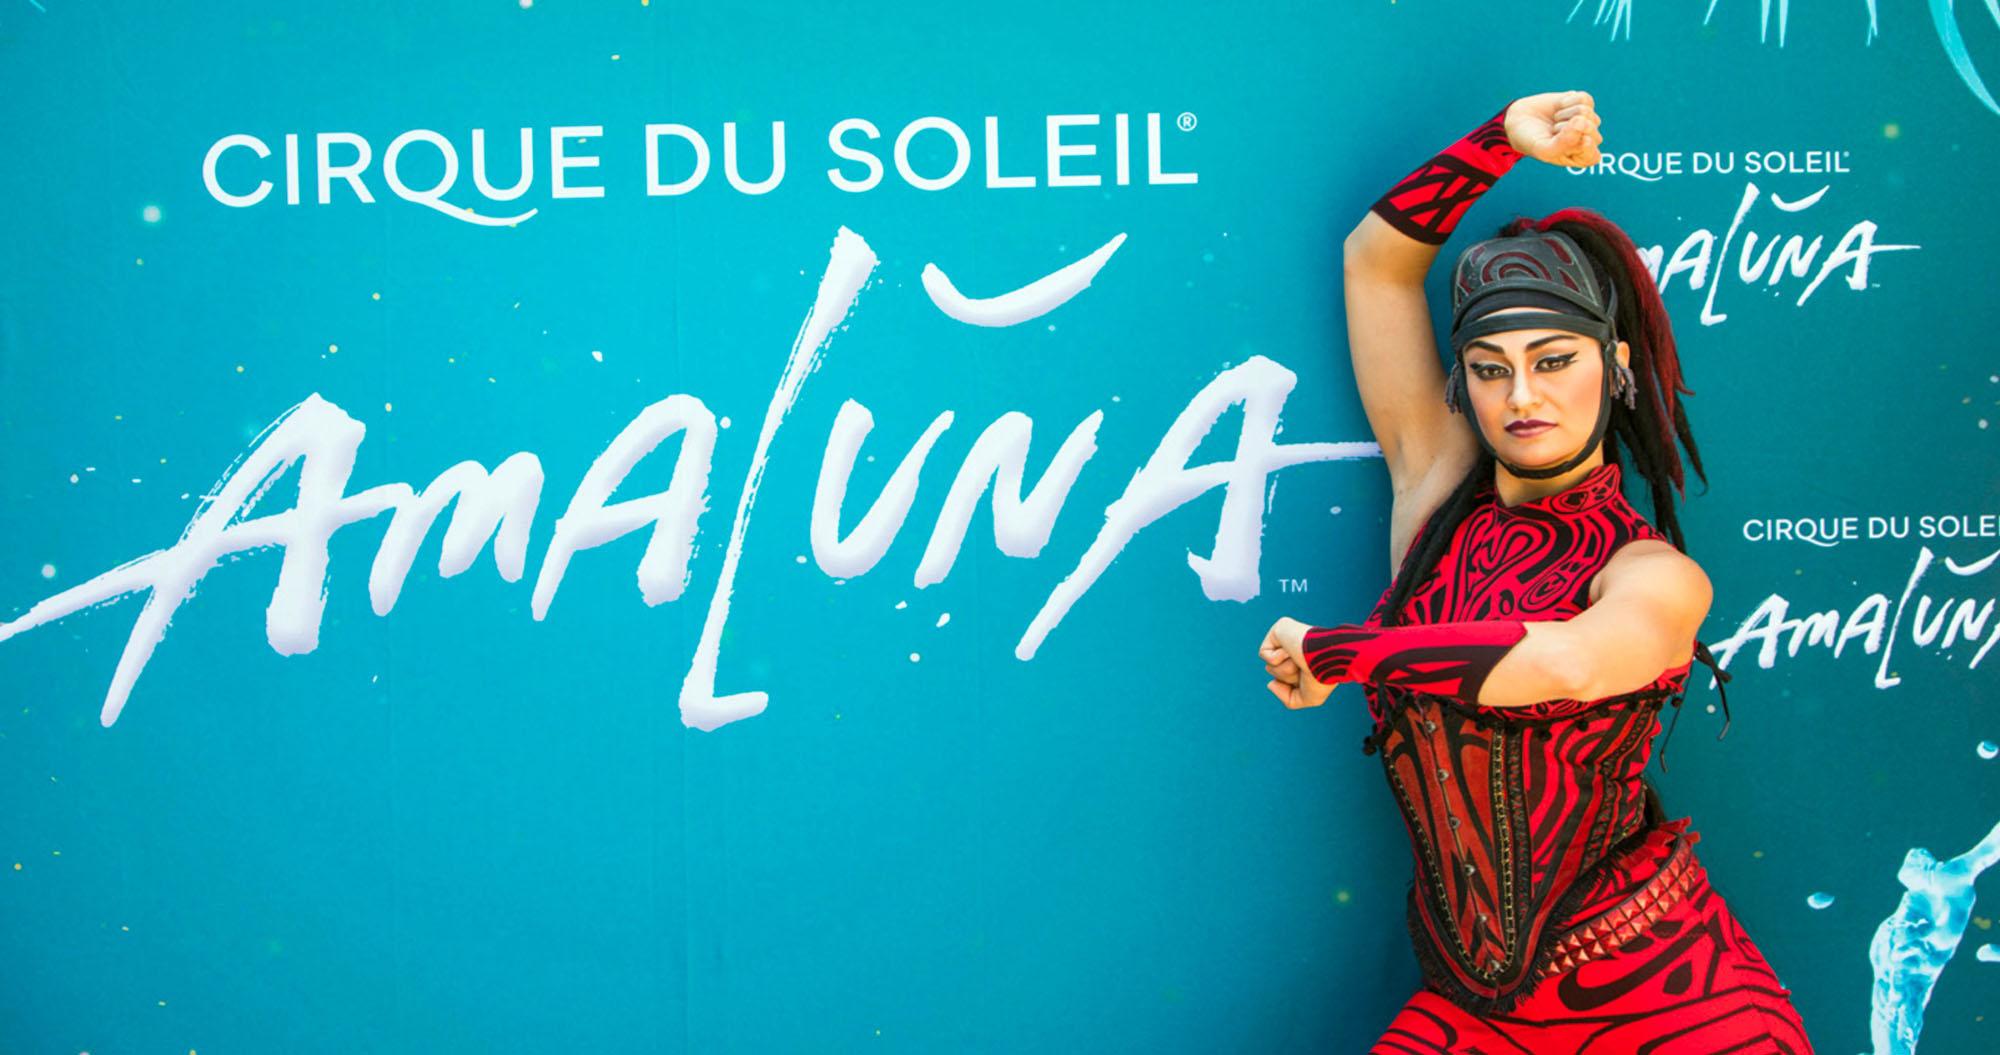 Photo of Amara Defilippo a performer in the Cirque du Soleil show Amaluna